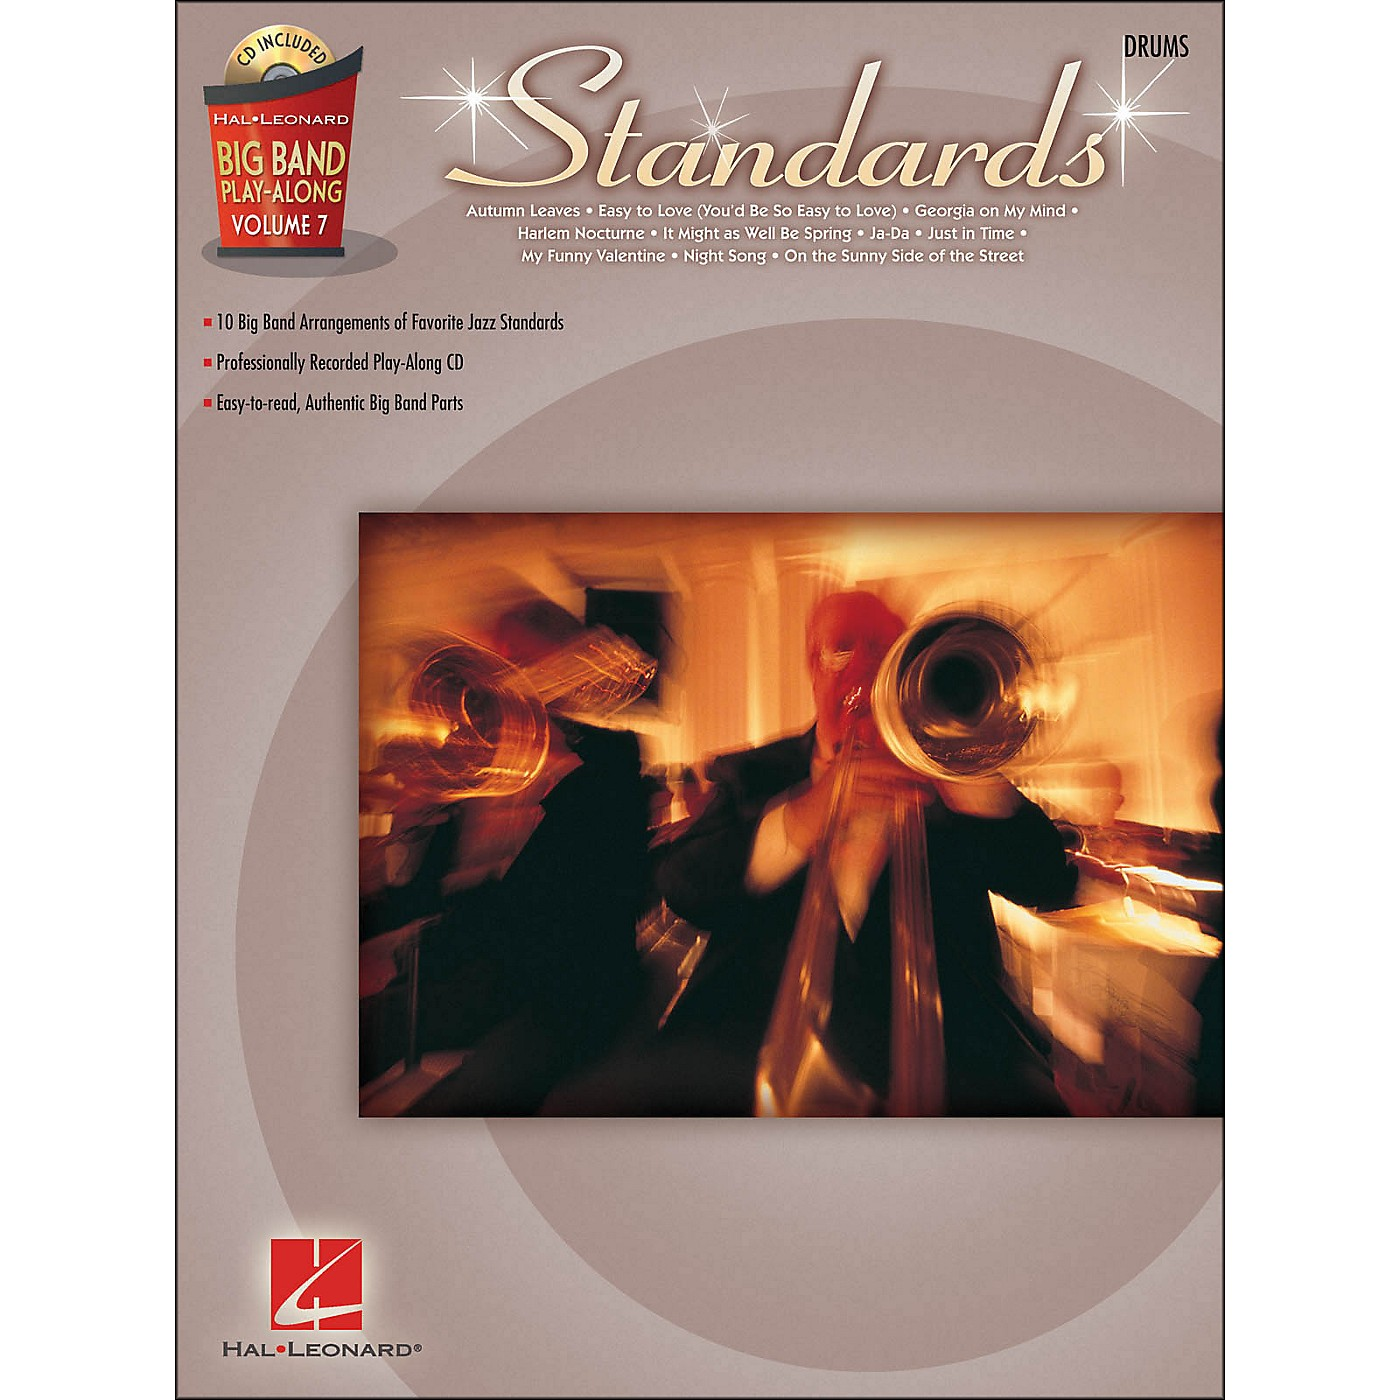 Hal Leonard Standards - Big Band Play-Along Vol. 7 Drums thumbnail